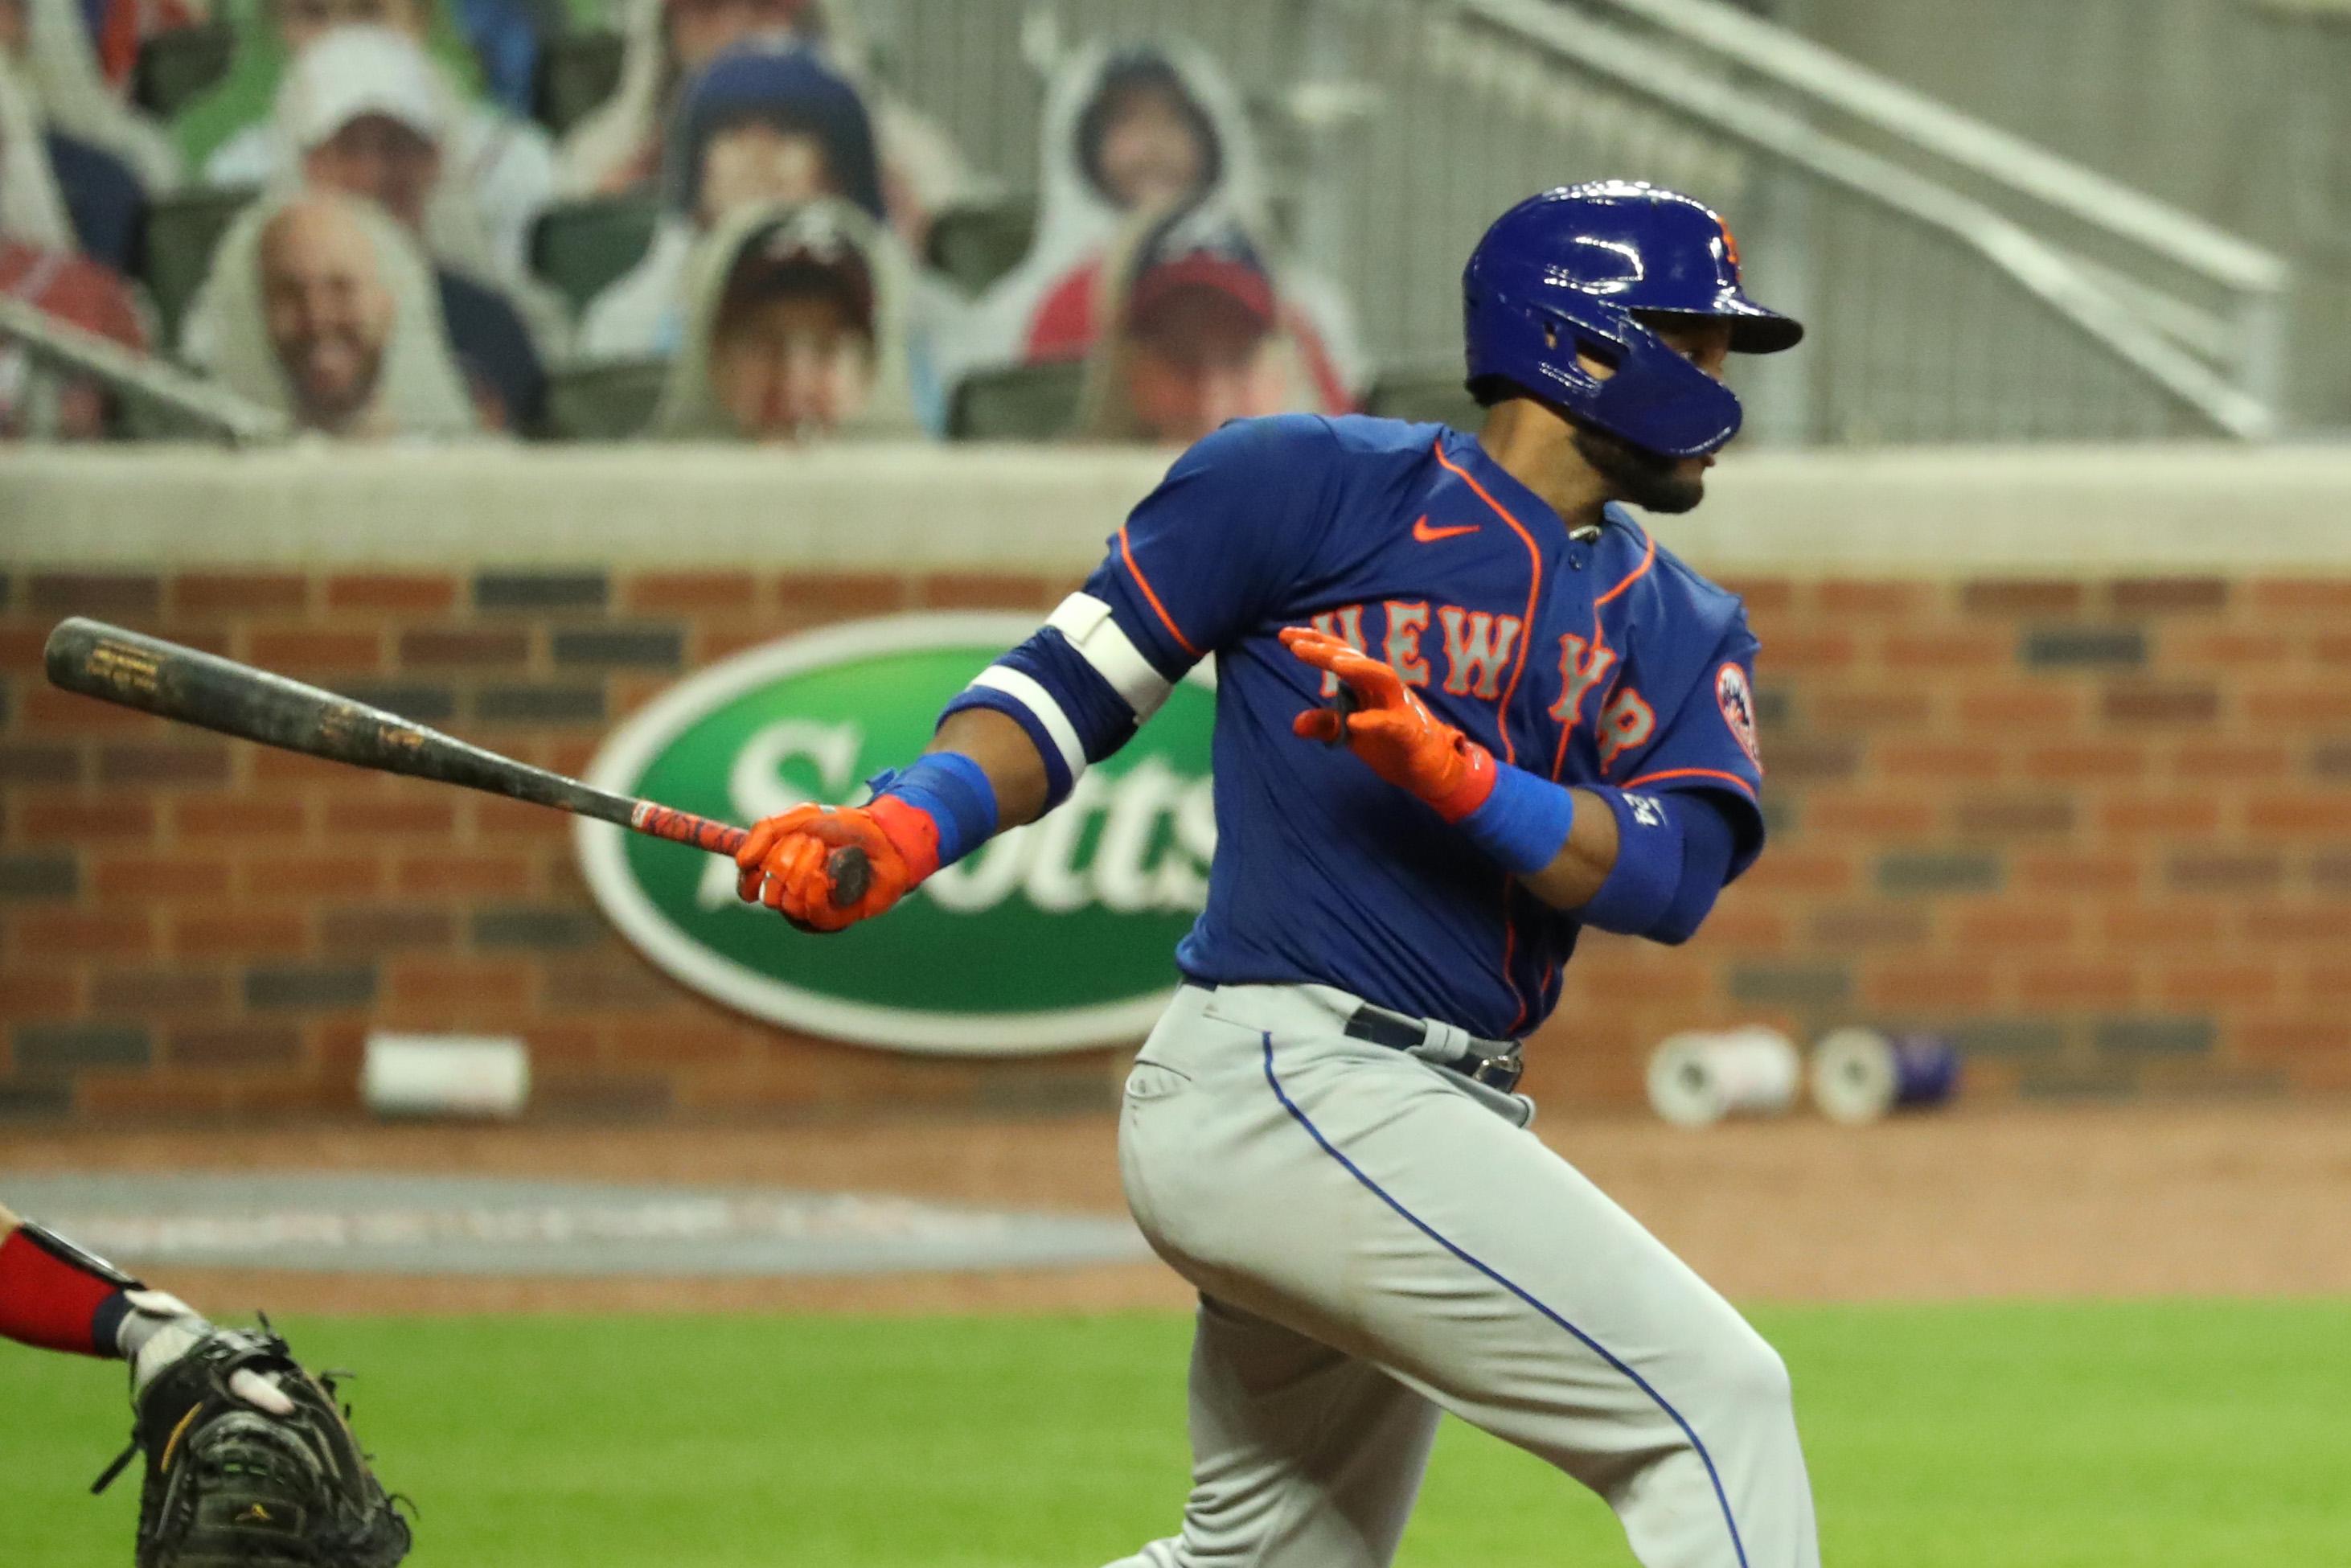 8/1/20 Game Preview: New York Mets at Atlanta Braves